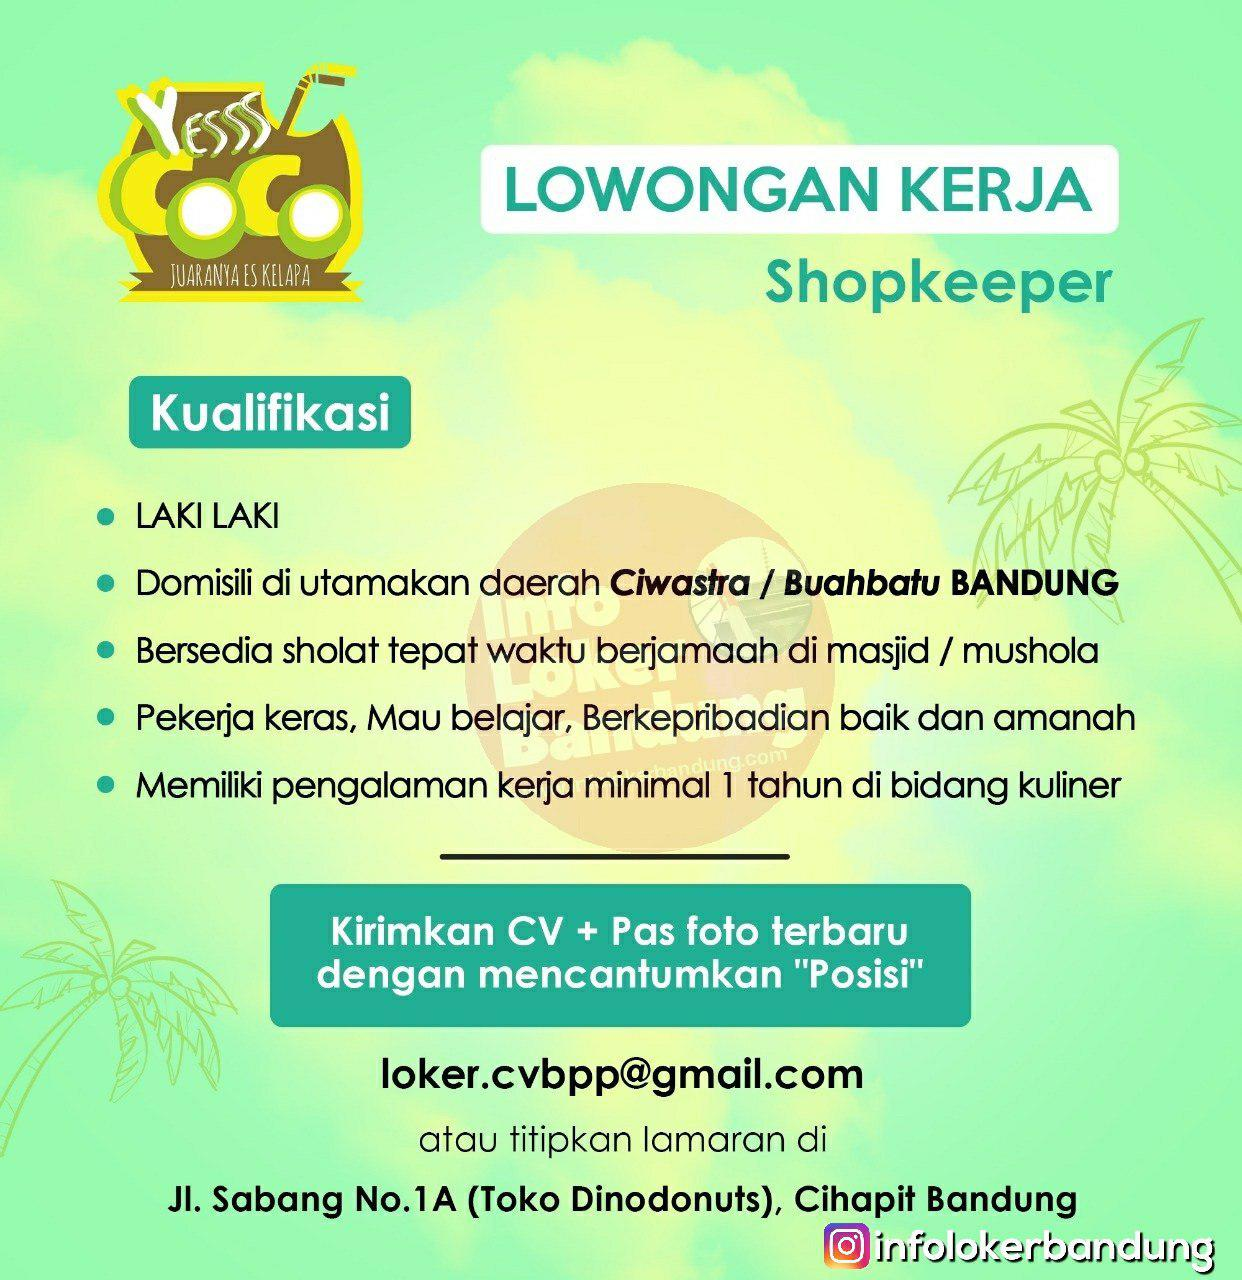 Lowongan Kerja Shopkeeper Es Coco Bandung Januari 2019